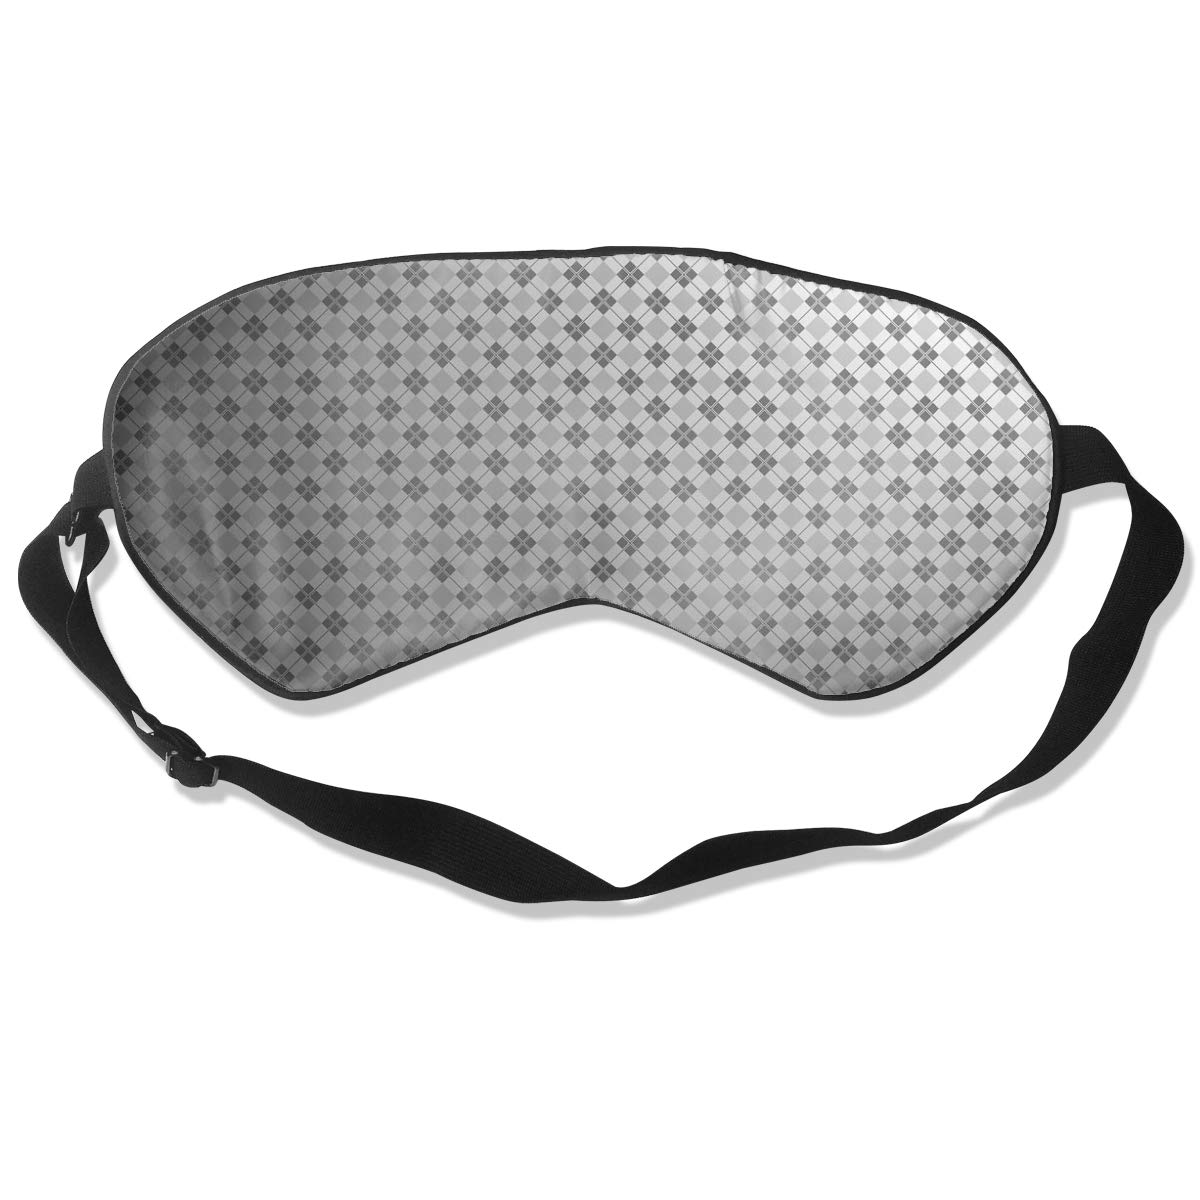 100% Silk Sleep Eye Mask, Square Pattern Night Sleep Mask, Meditation With Adjustable Straps, Blocks Light, Suitable For Sleeping Travel Work Naps